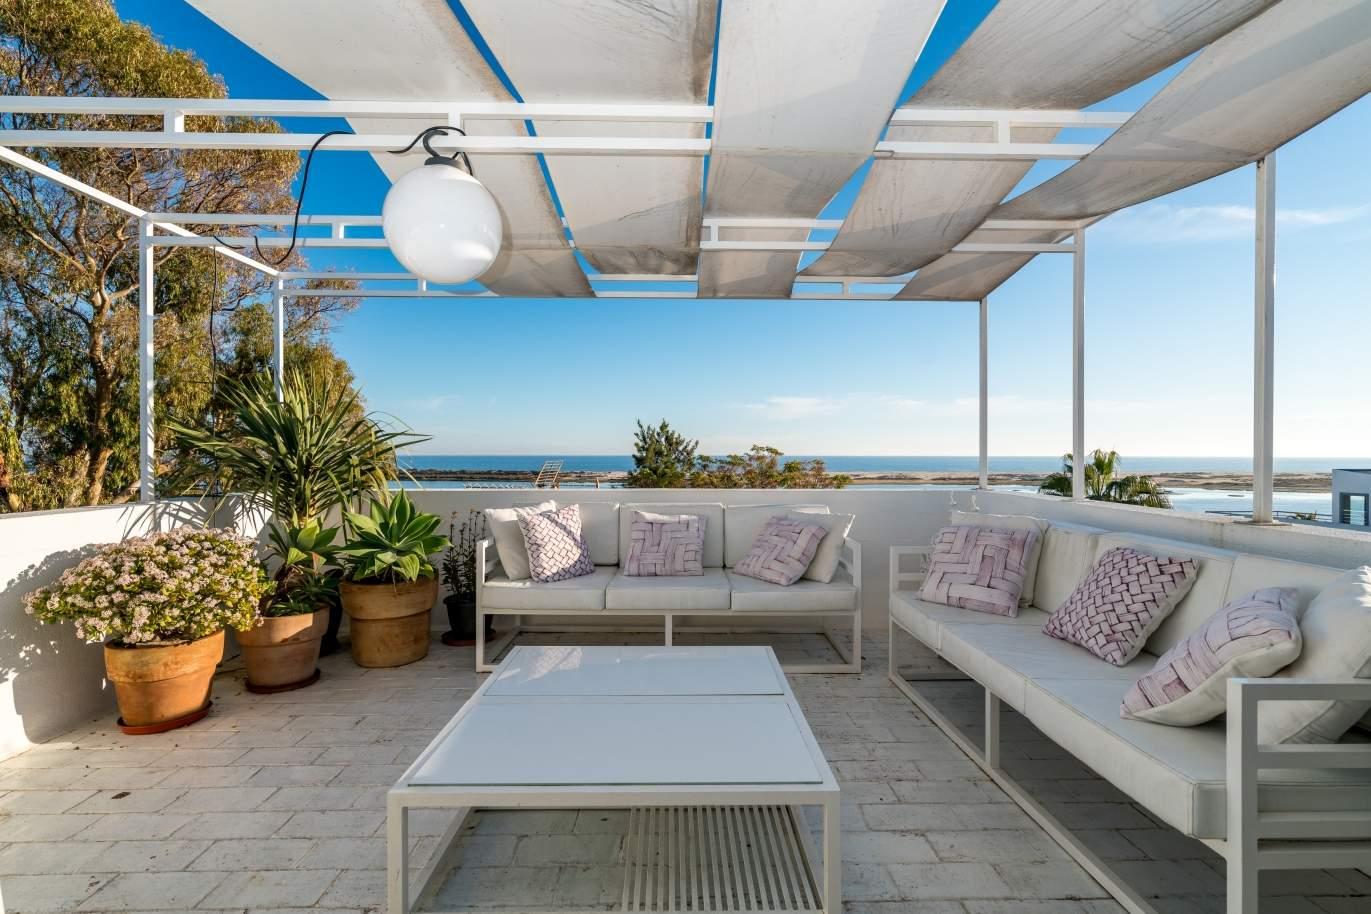 sale-of-building-with-sea-view-vila-nova-de-cacela-algarve-portugal